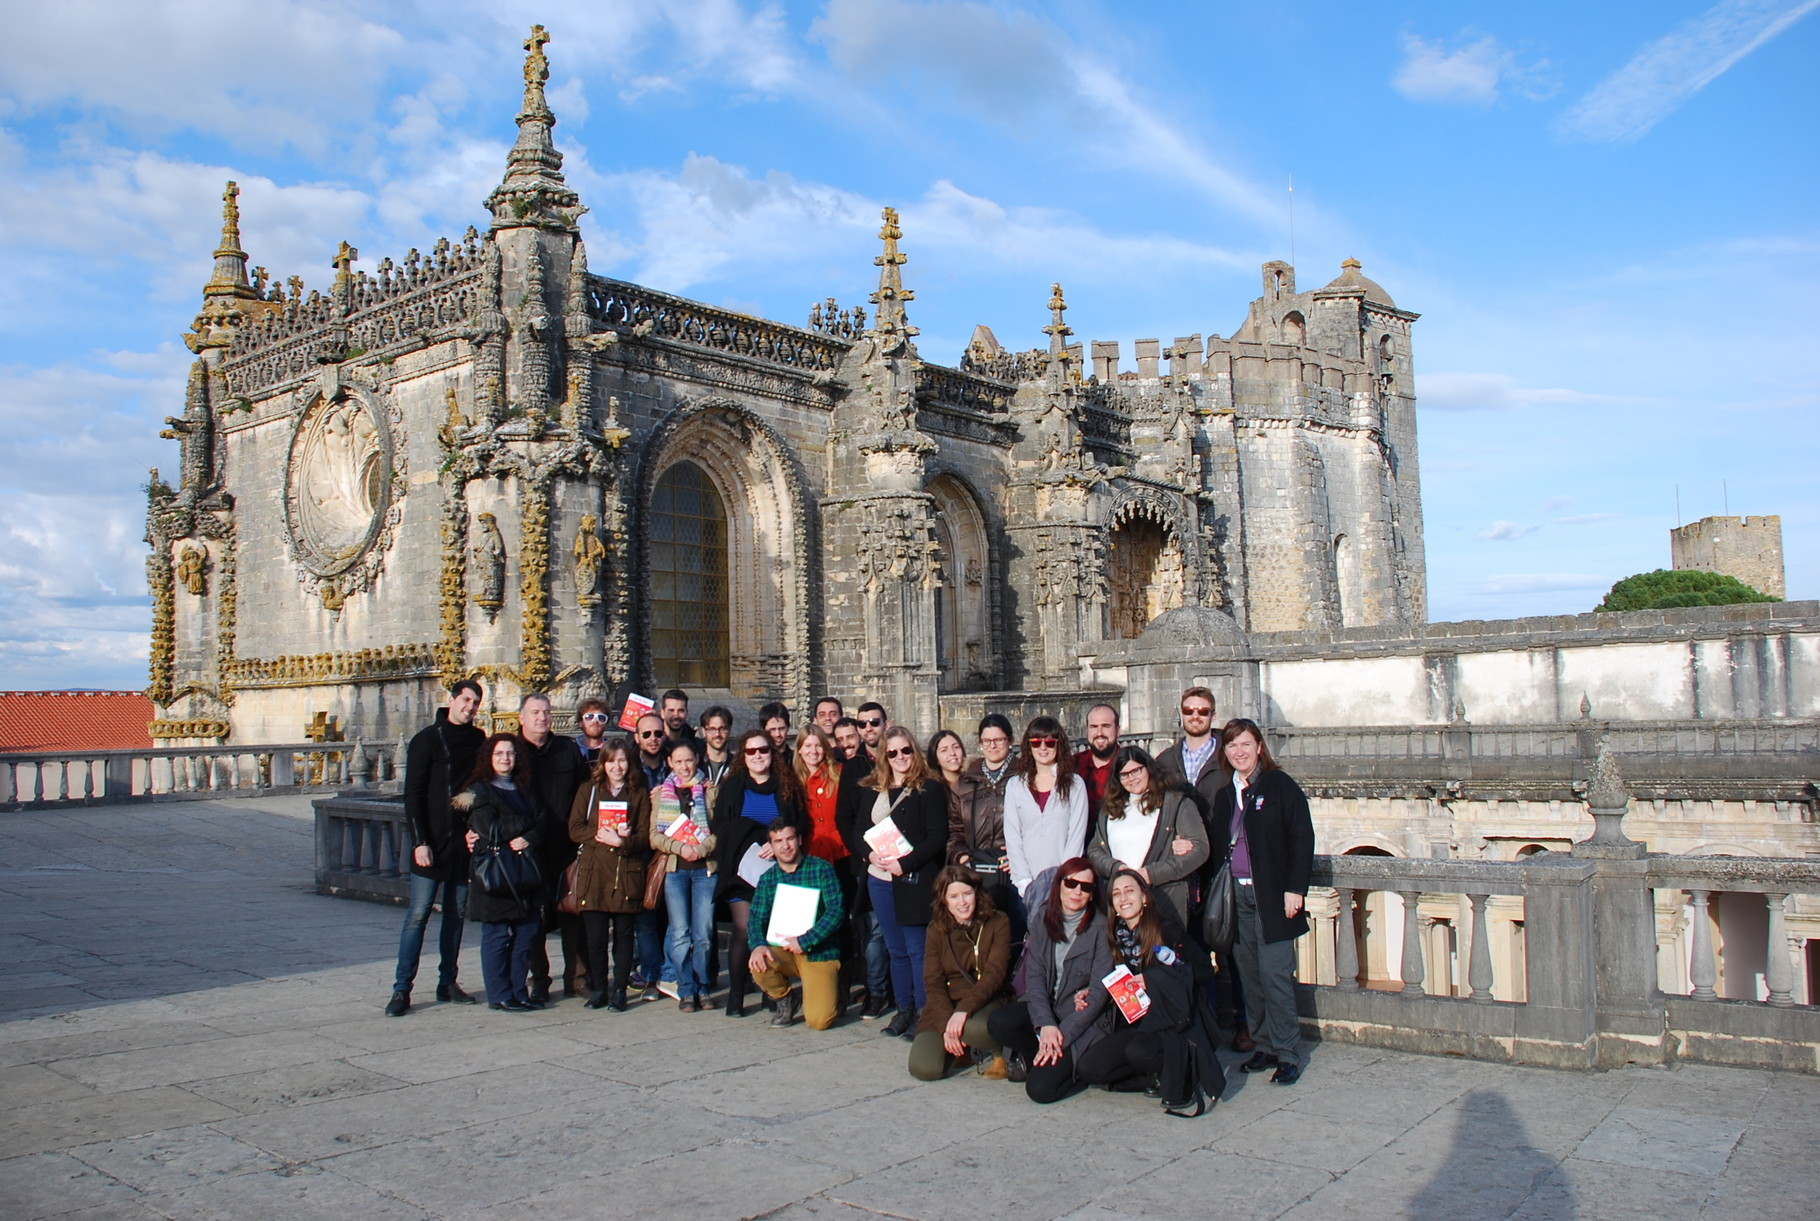 2015. Castillo de Tomar